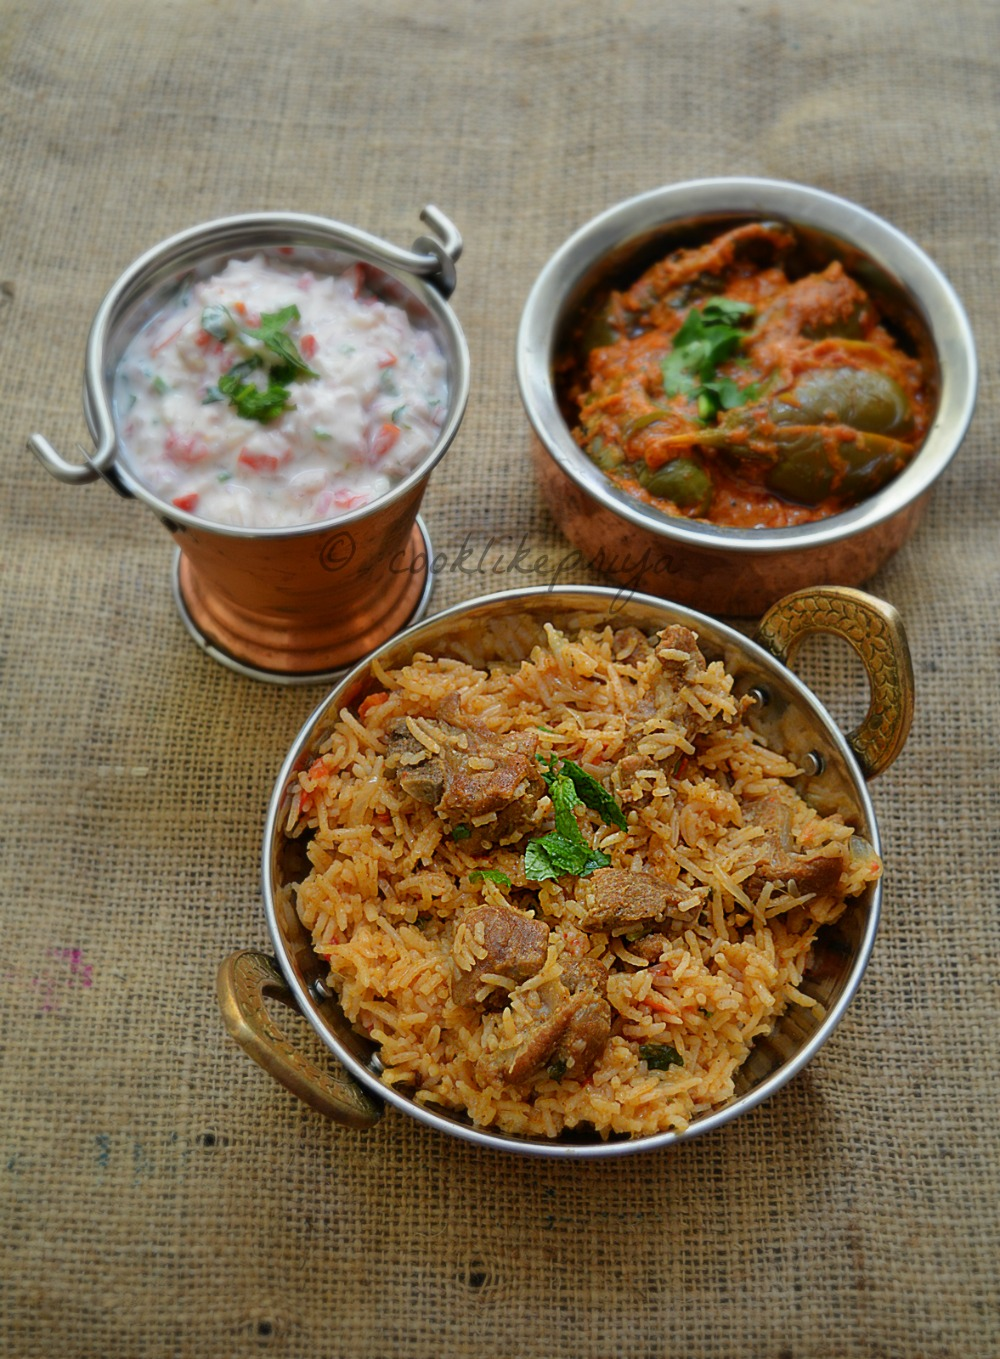 Tamil style Mutton/Goat Biryani